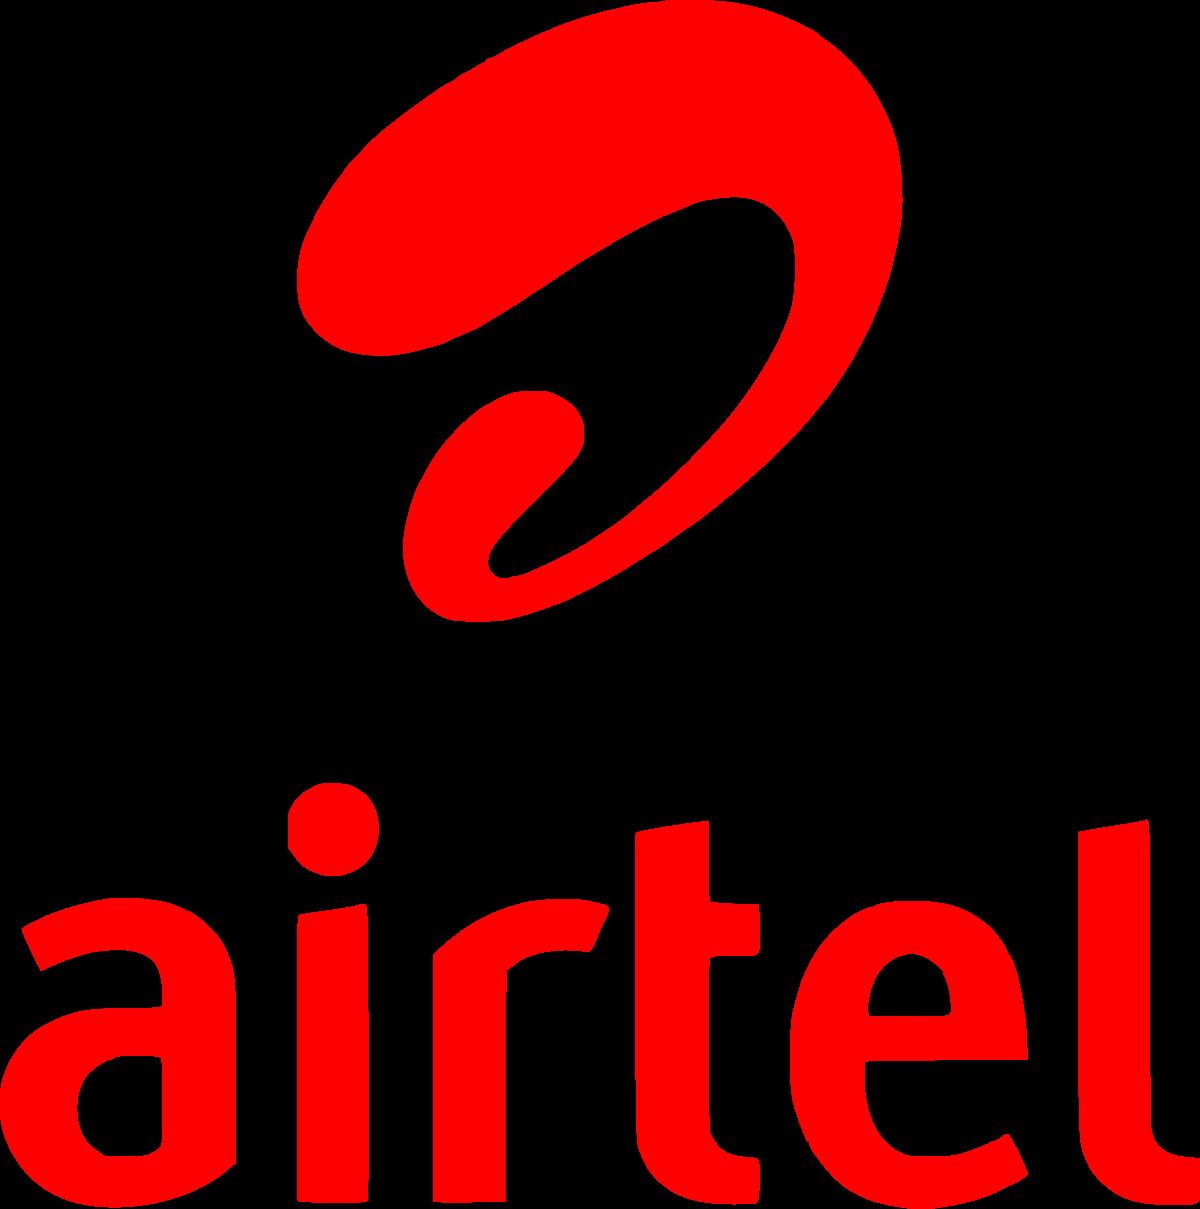 Kazang-Zambia-Products-Airtime-Airtel